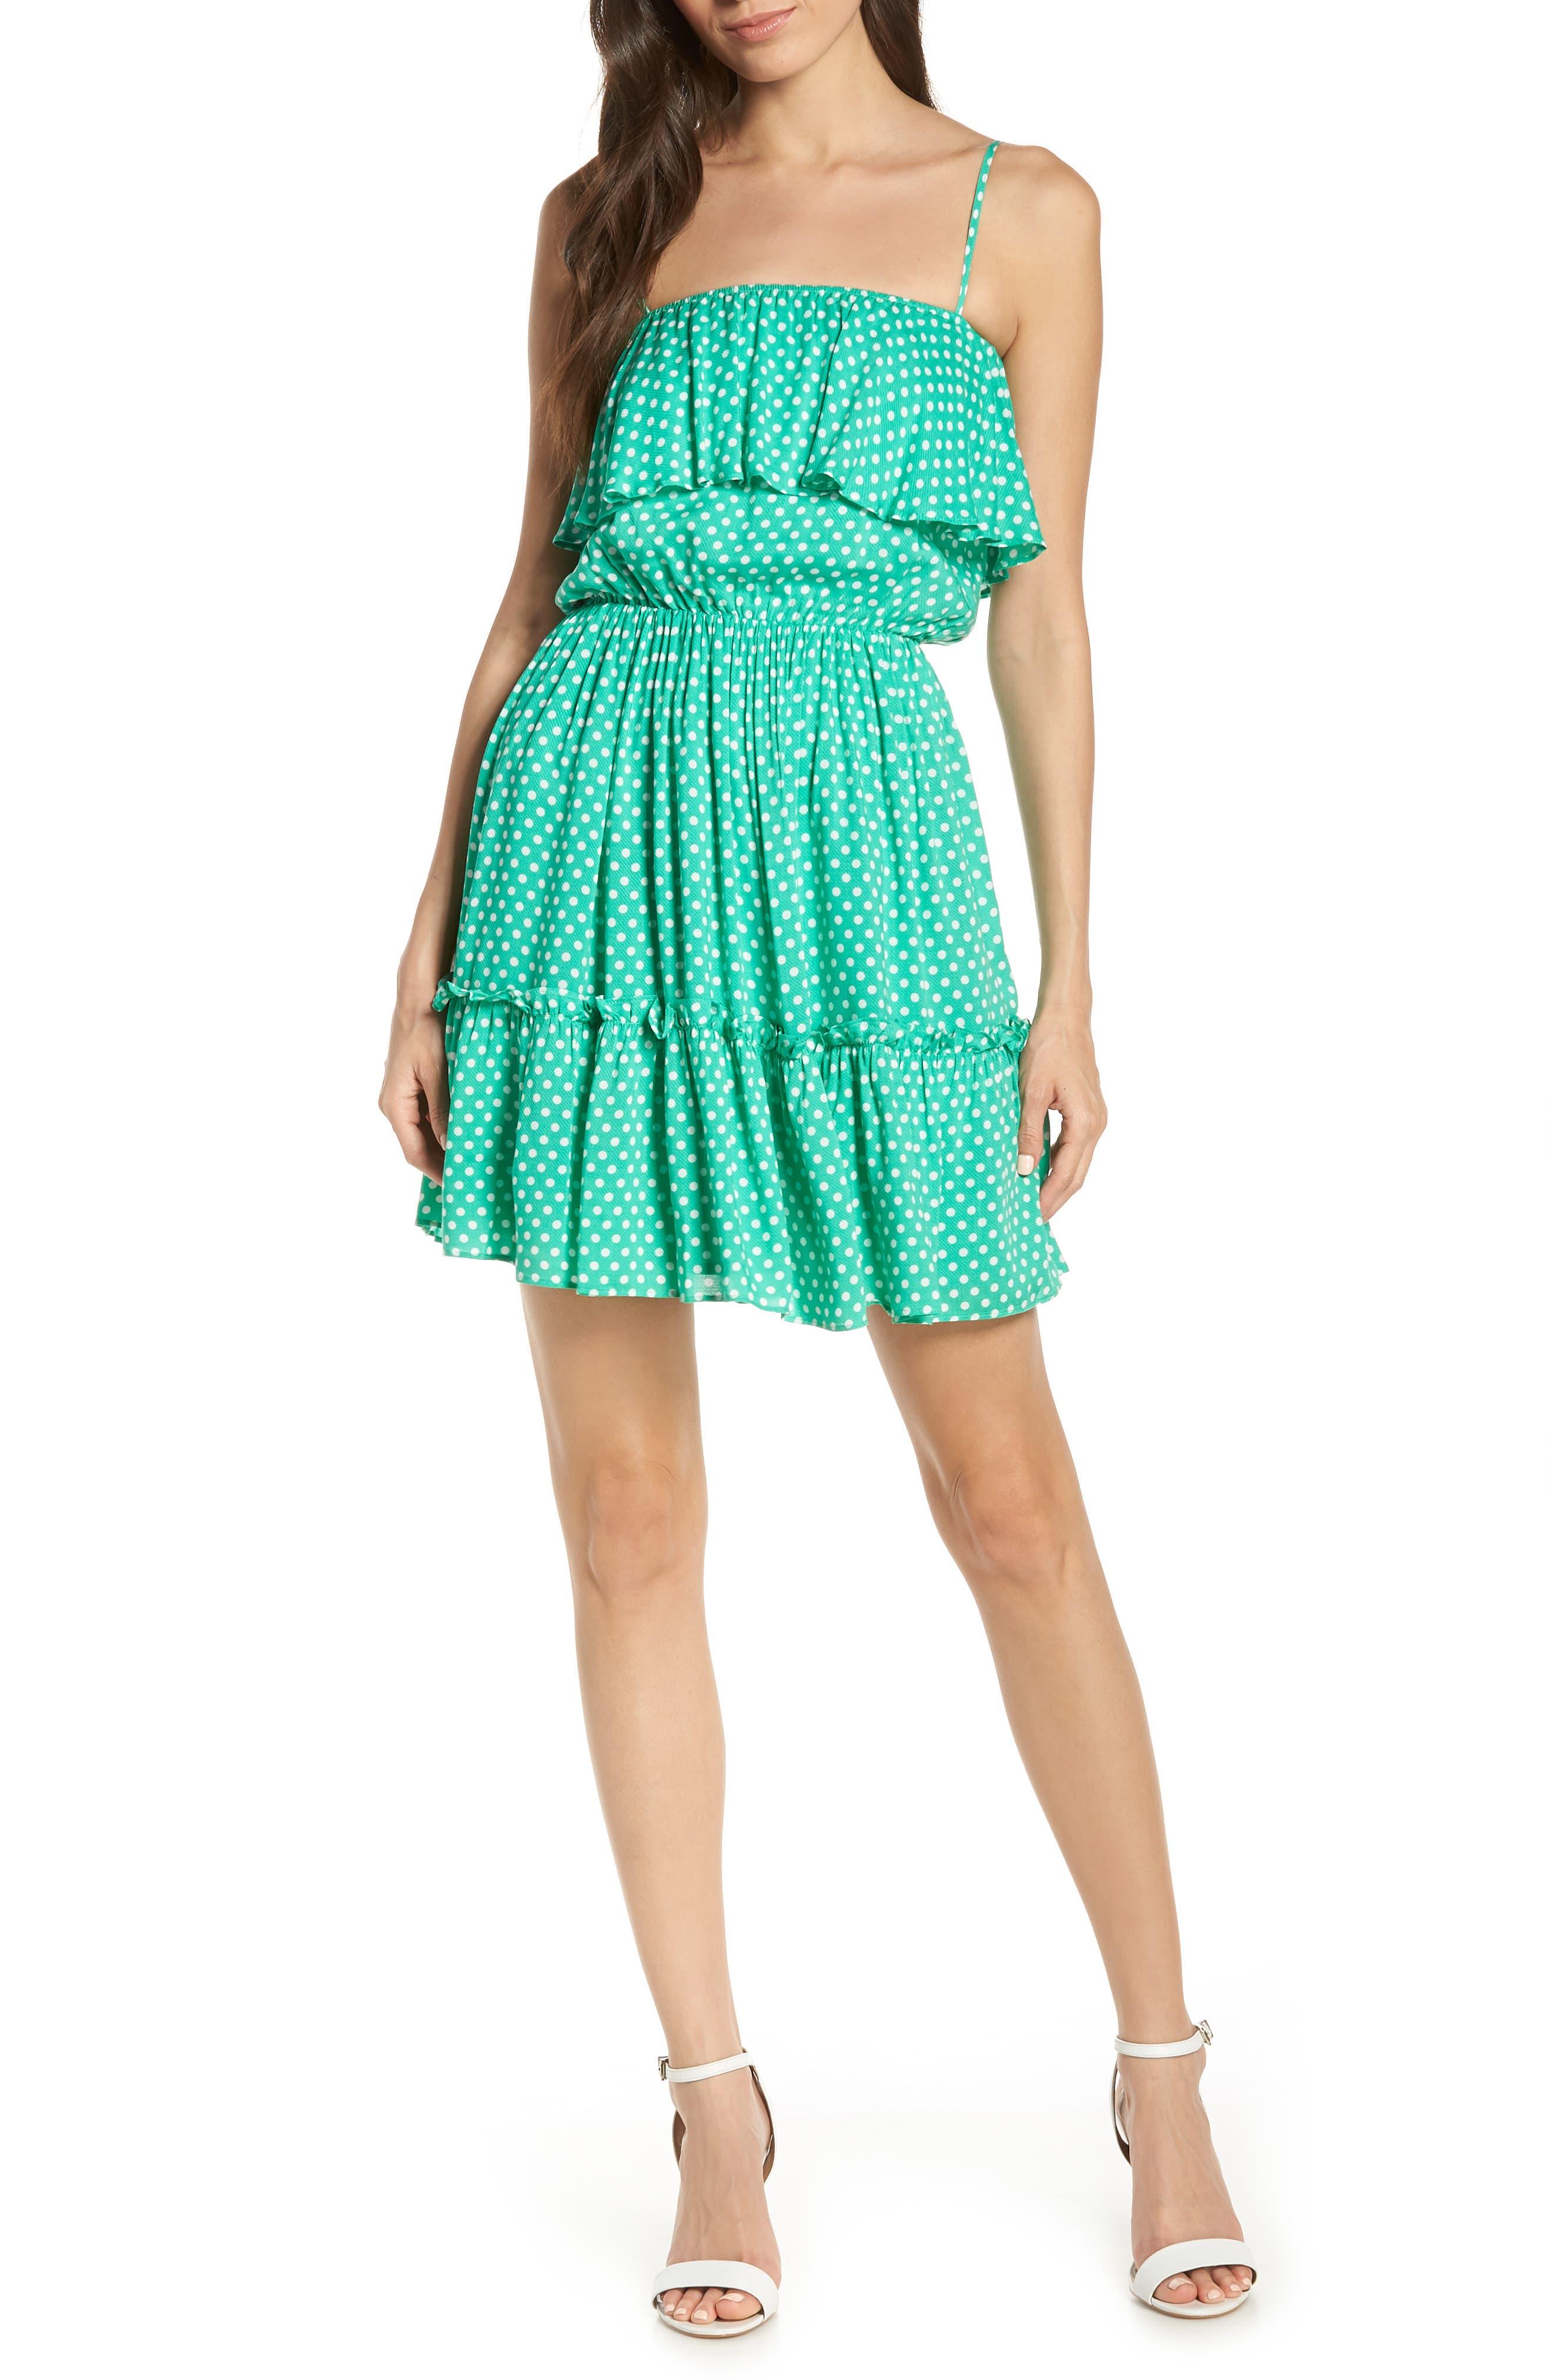 Bb Dakota Dot Off The Press Polka Dot Dress, Green